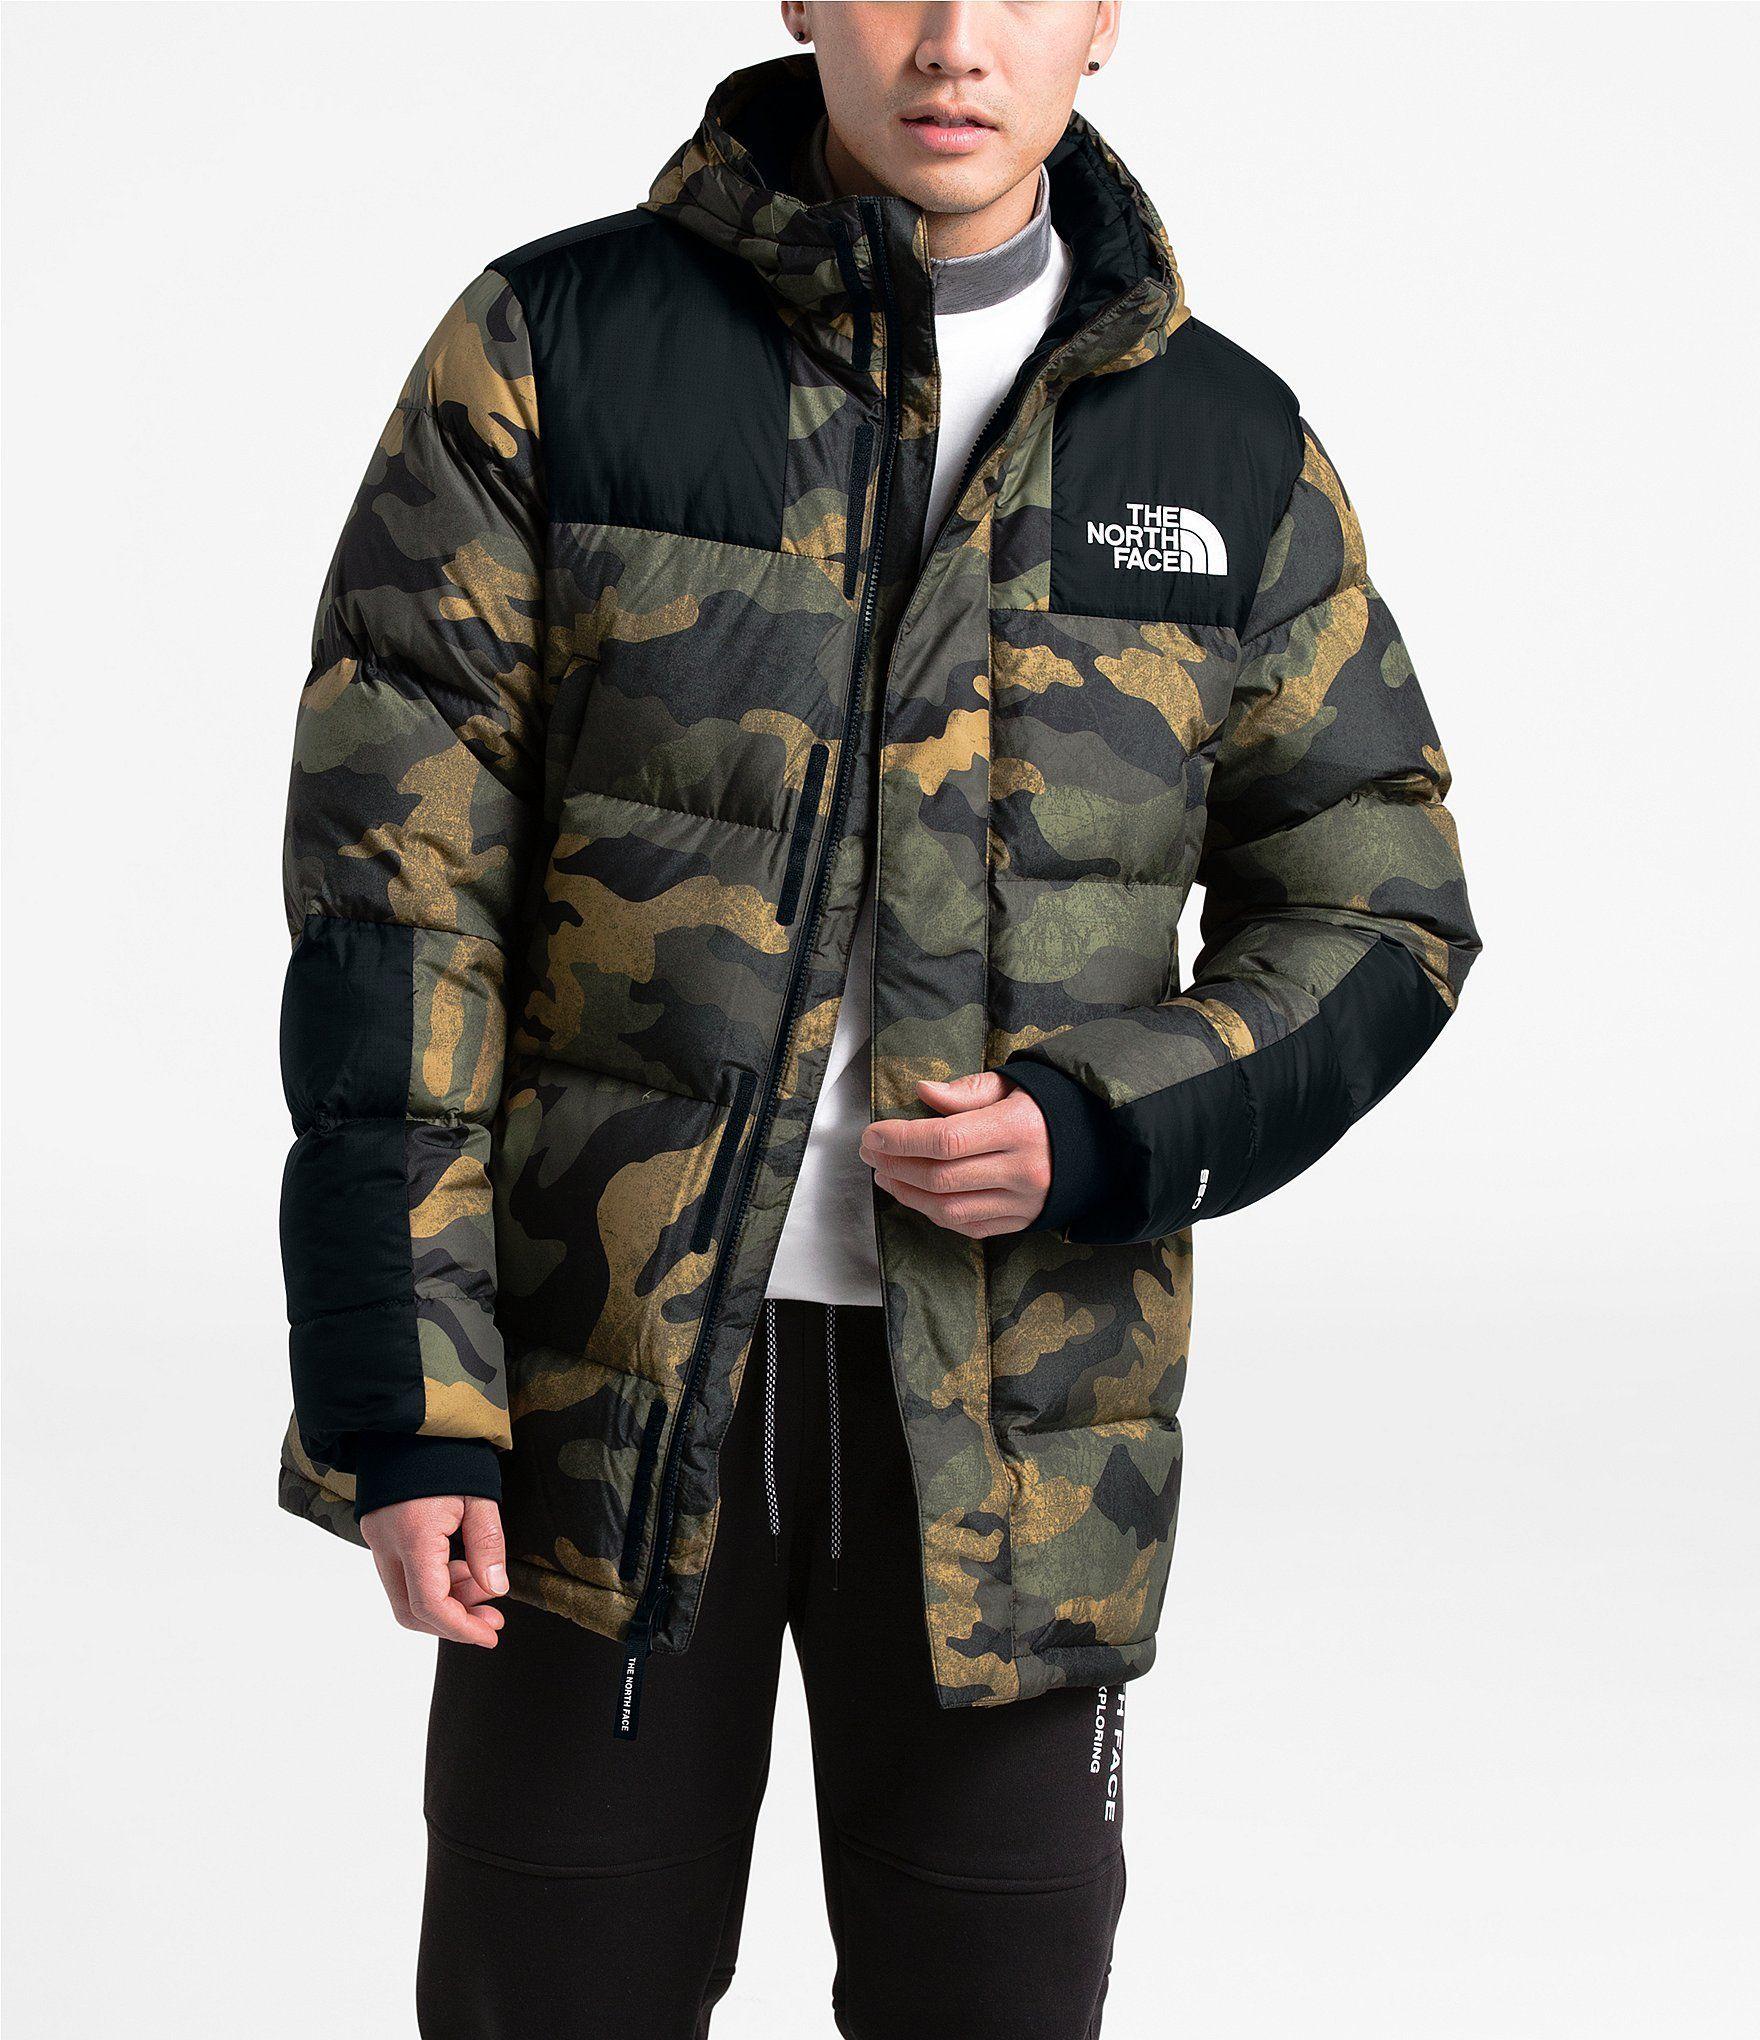 The North Face Camo Print Deptford Down Parka Coat Burnt Olive Green Waxed Camo Print Xl Mens Jackets Down Jacket Jackets [ 2040 x 1760 Pixel ]